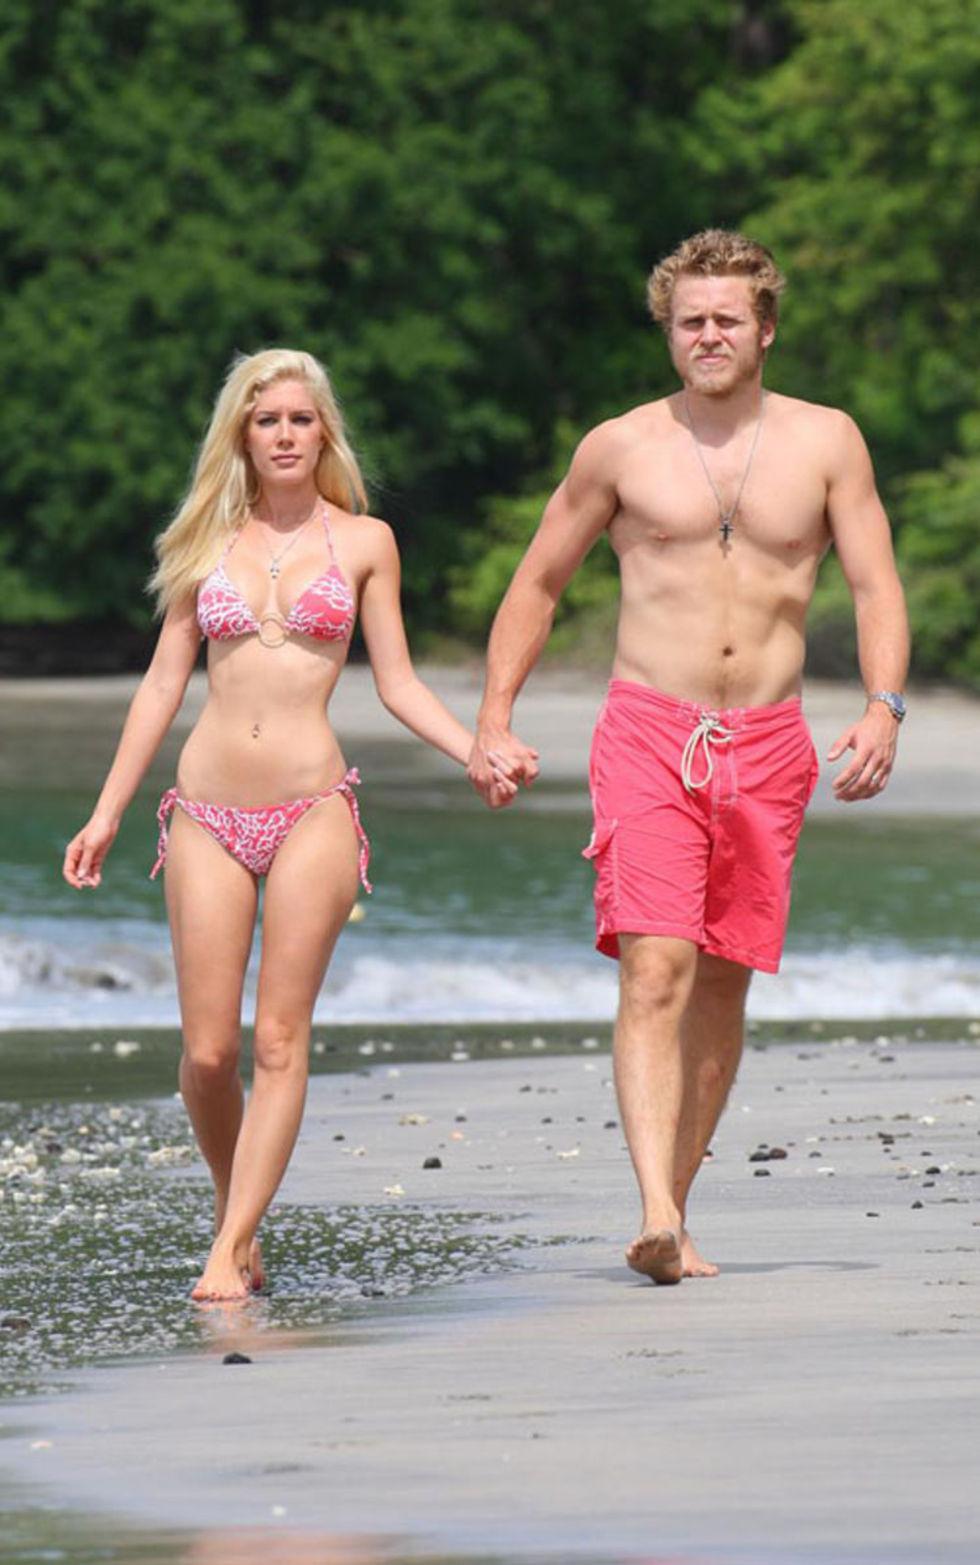 heidi-montag-bikini-candids-at-the-beach-in-costa-rica-mq-01